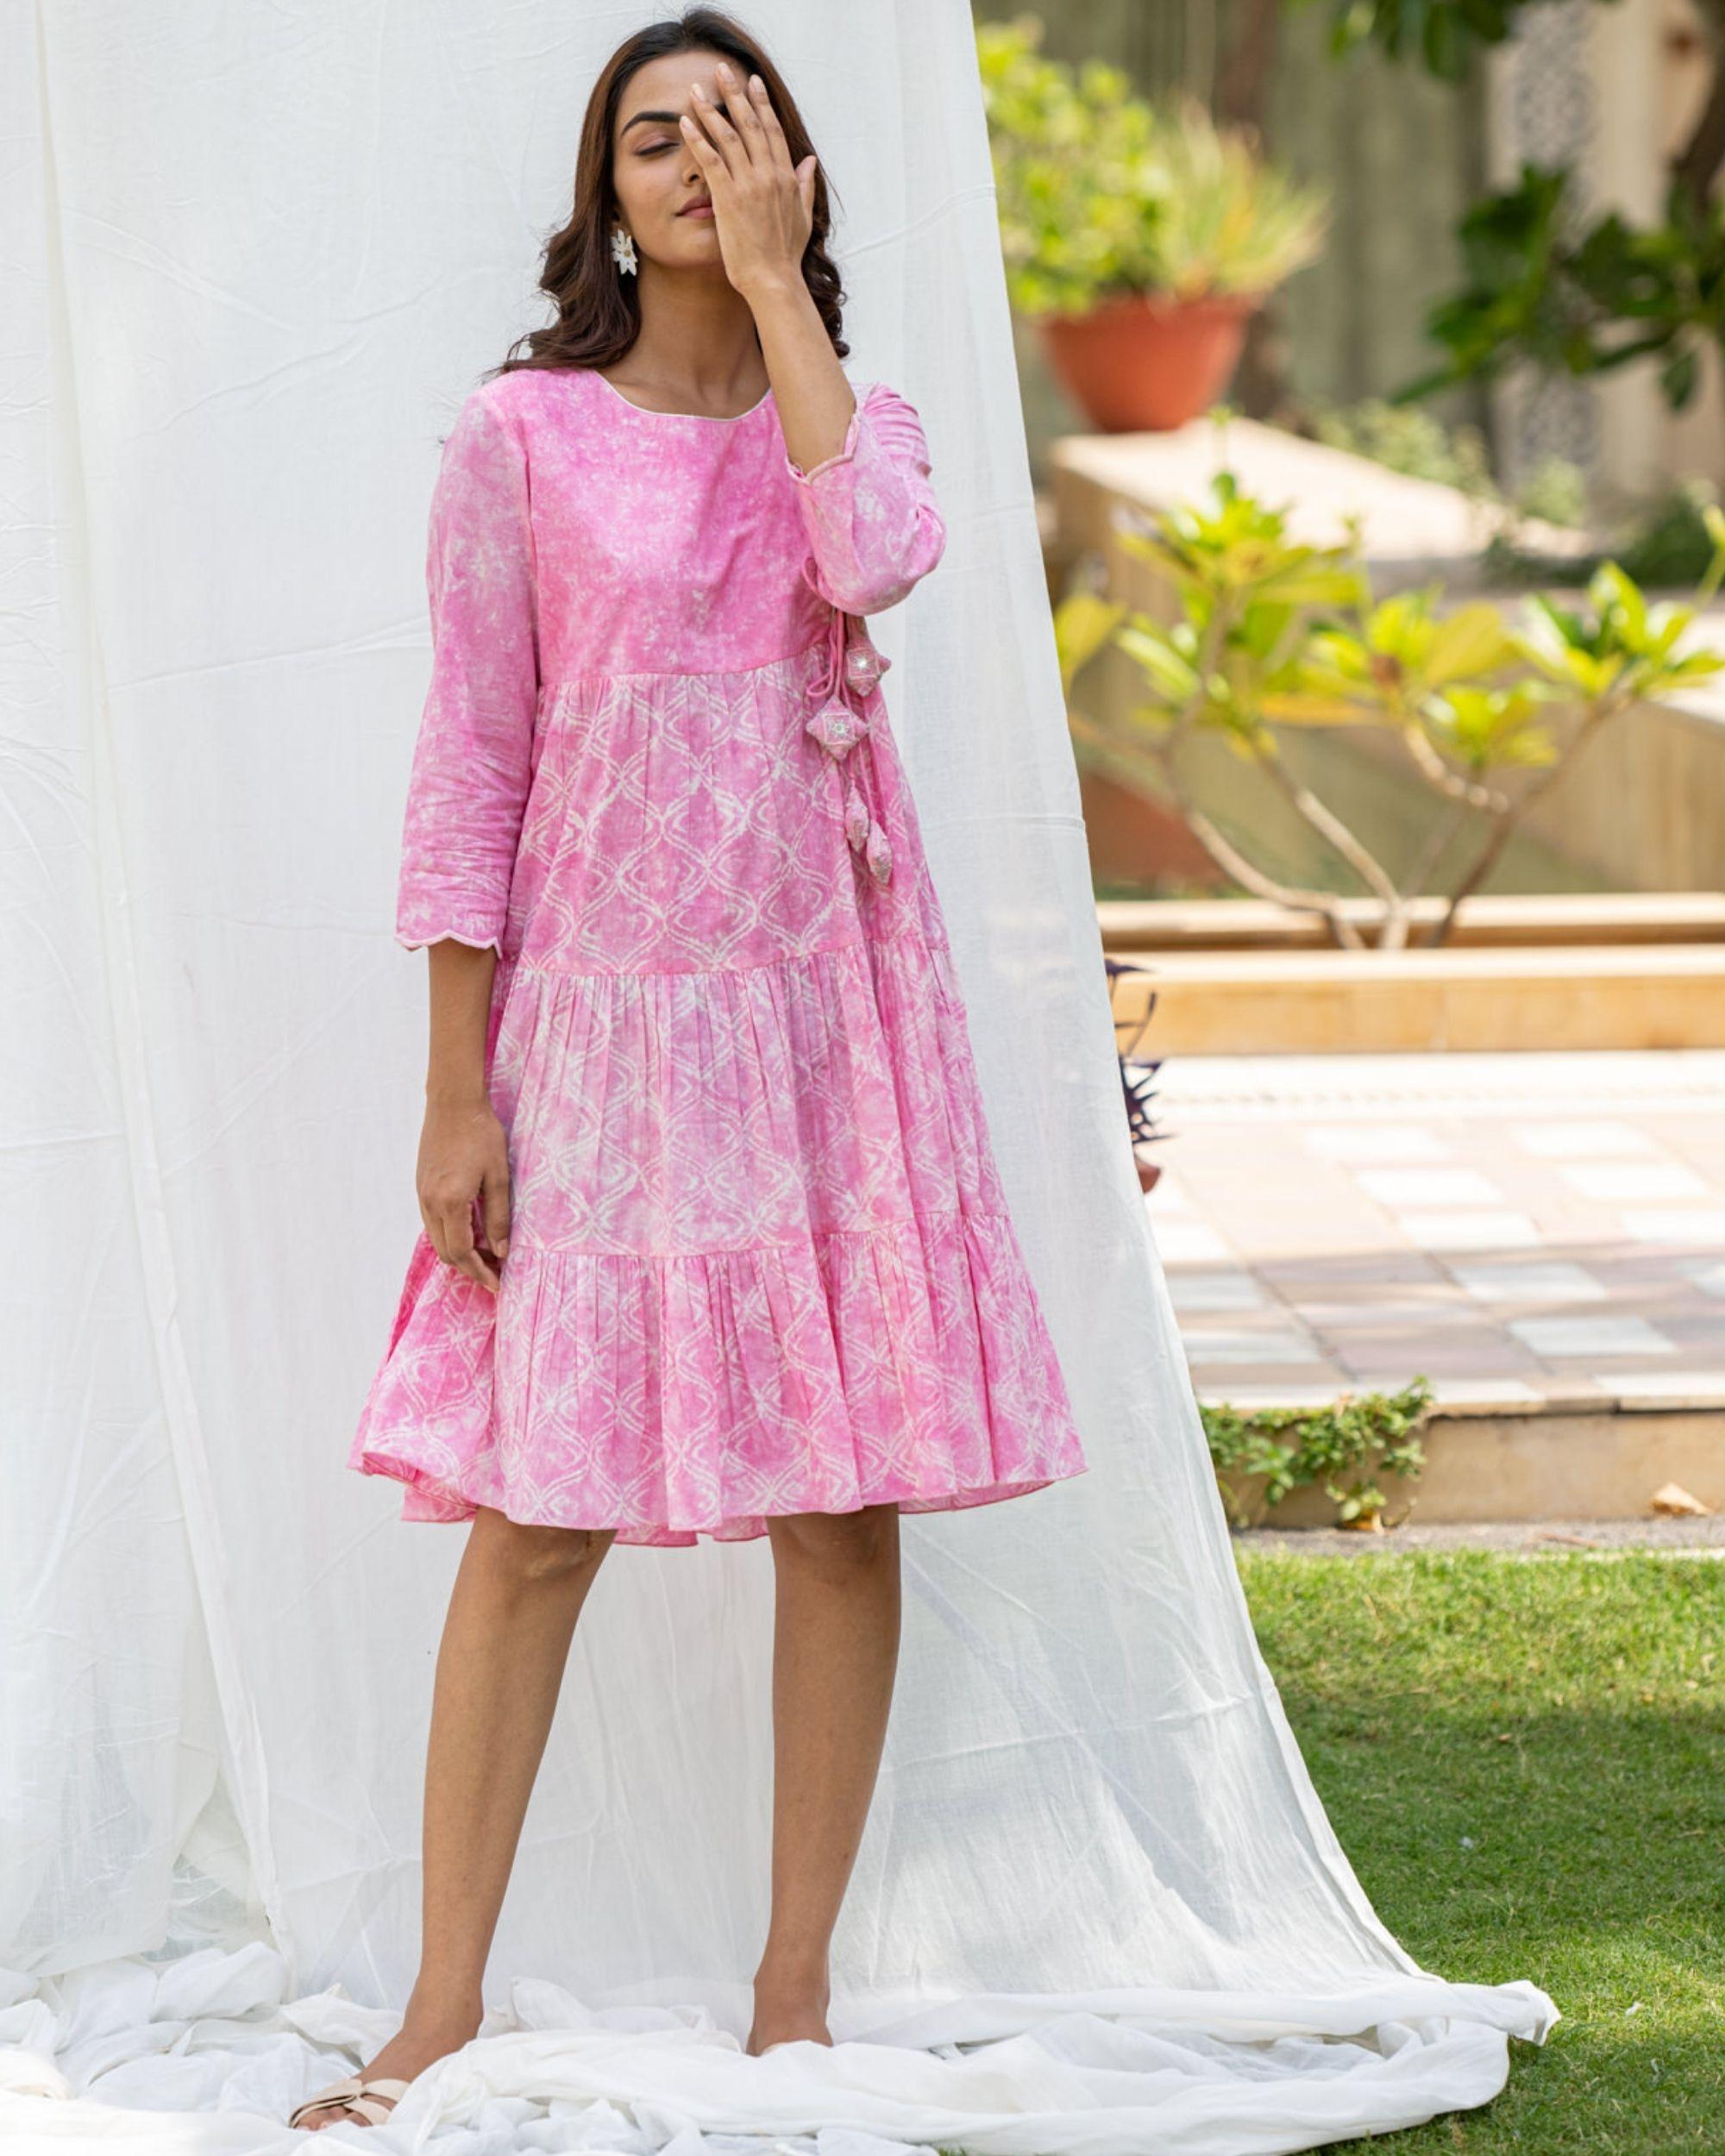 Blush pink tiered flare dress